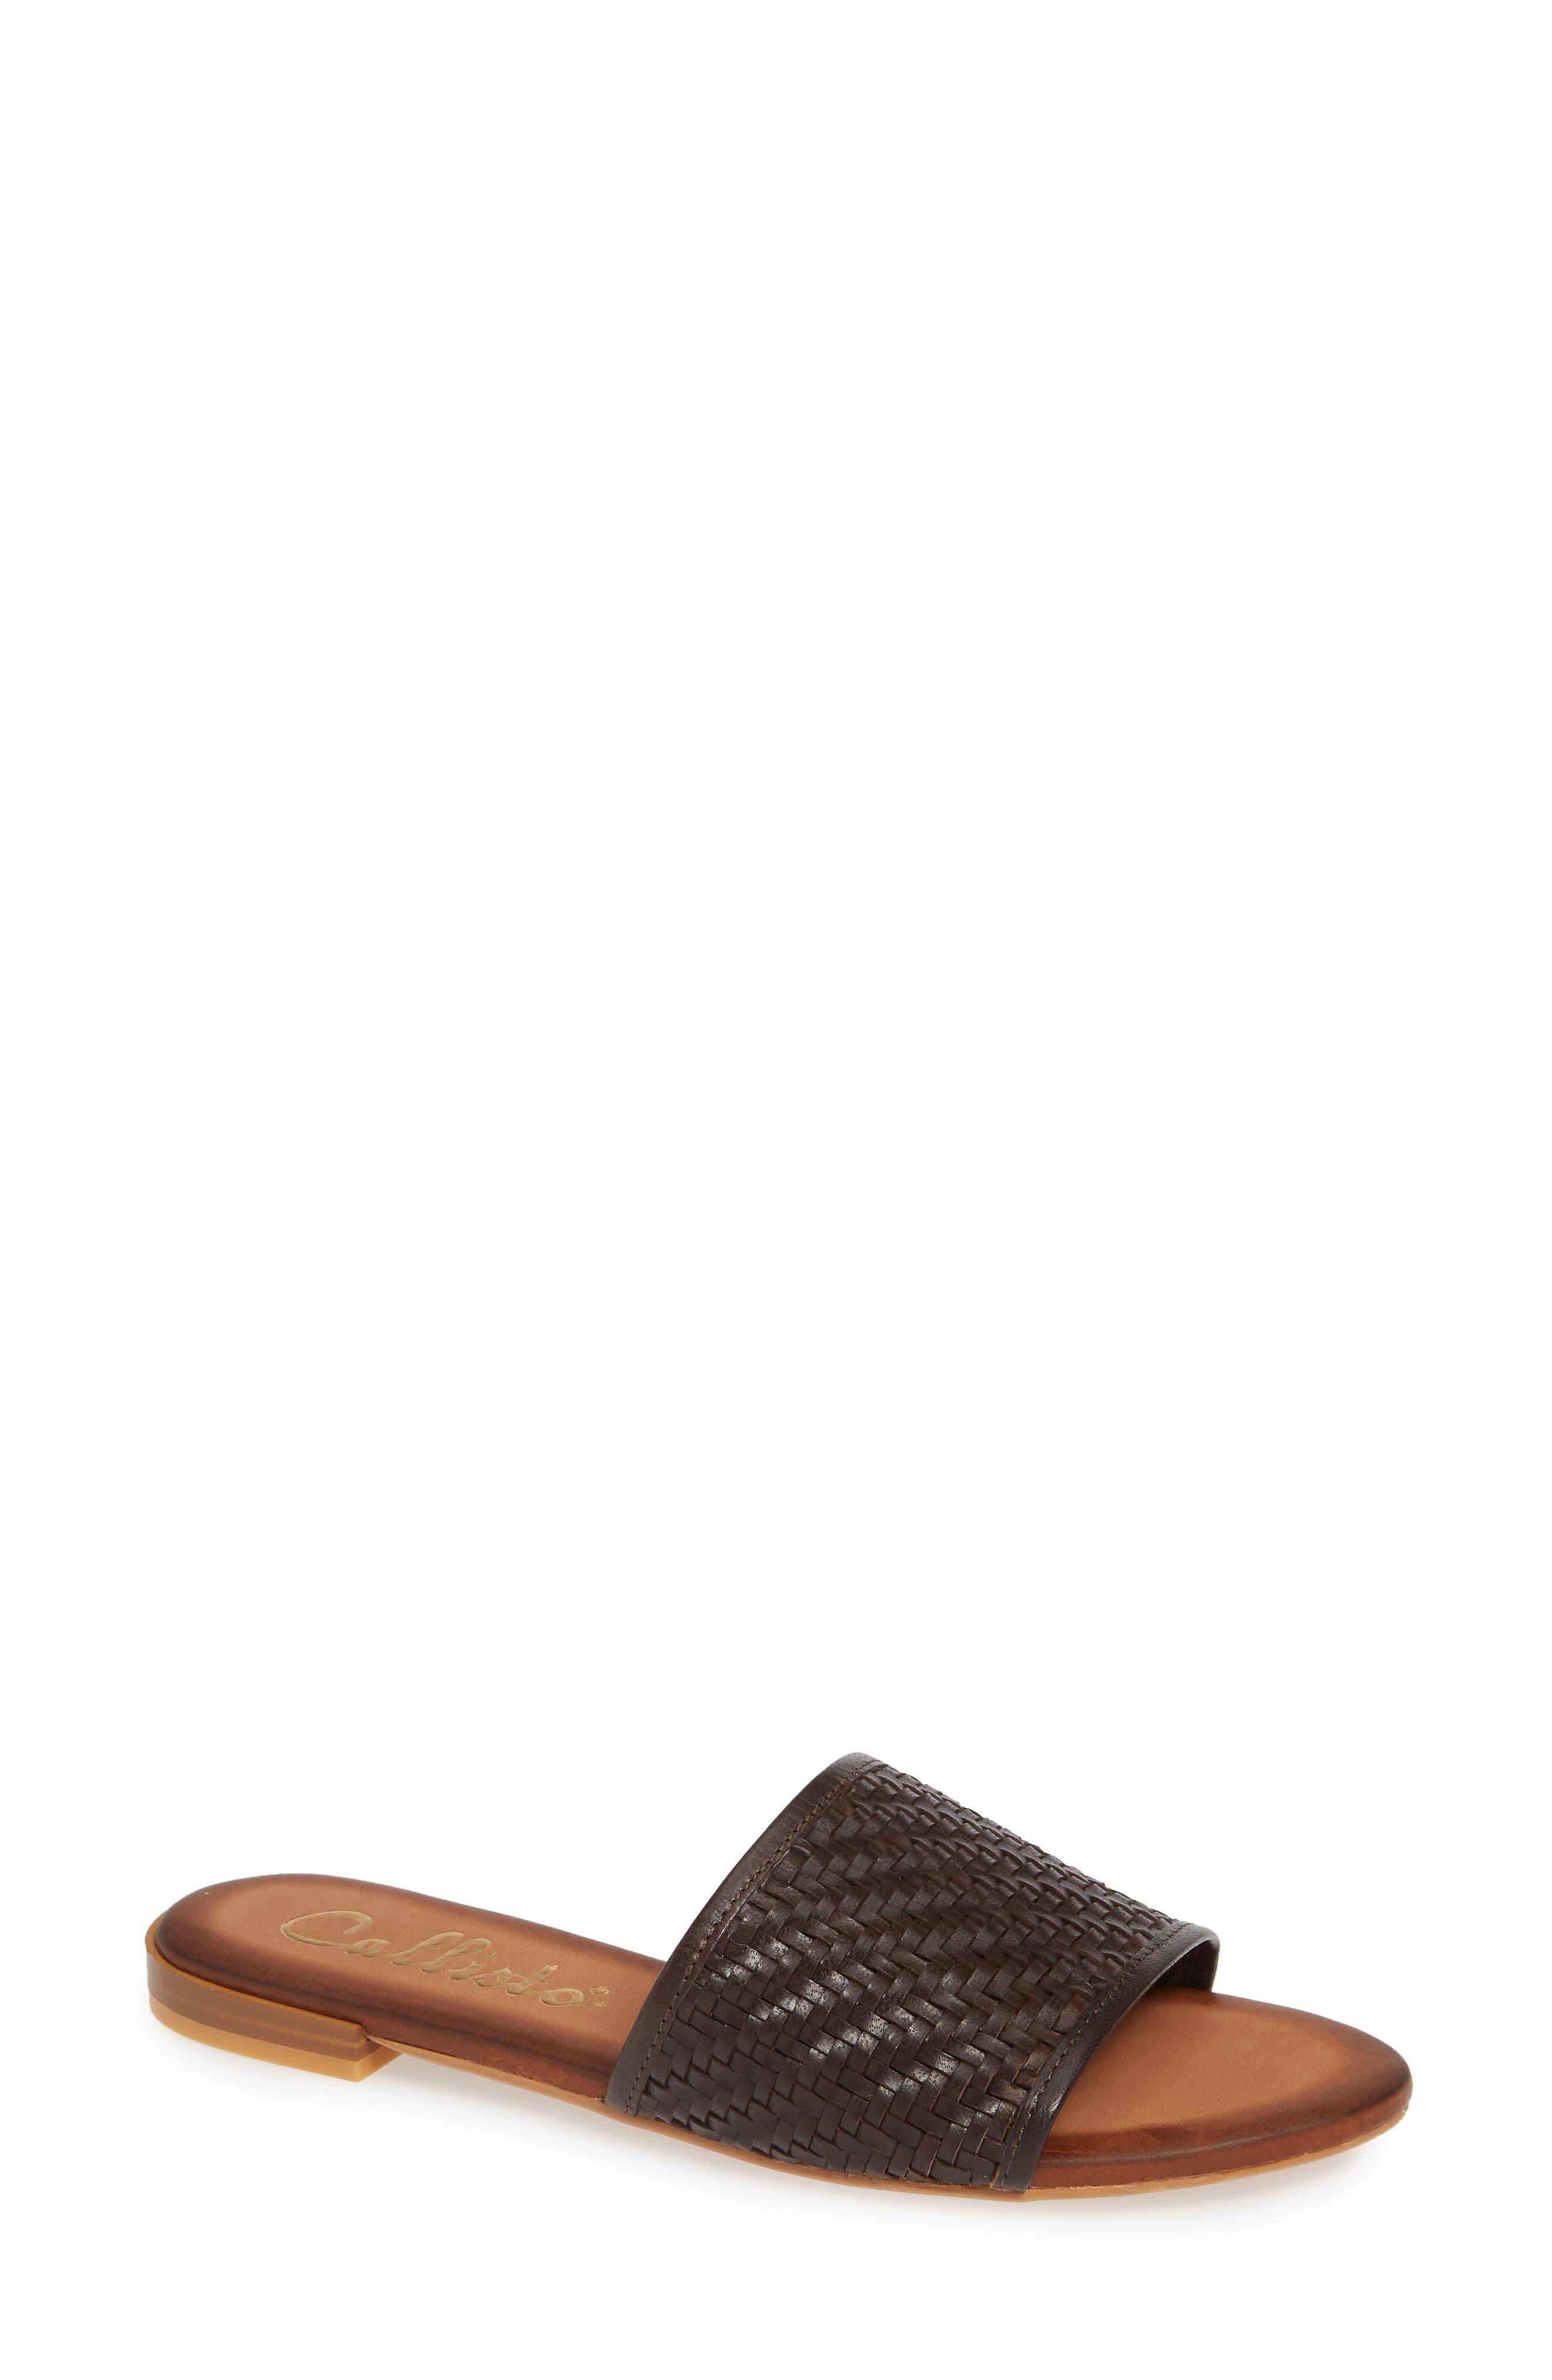 CALLISTO Thera Woven Slide Sandal, Main, color, BROWN WOVEN LEATHER